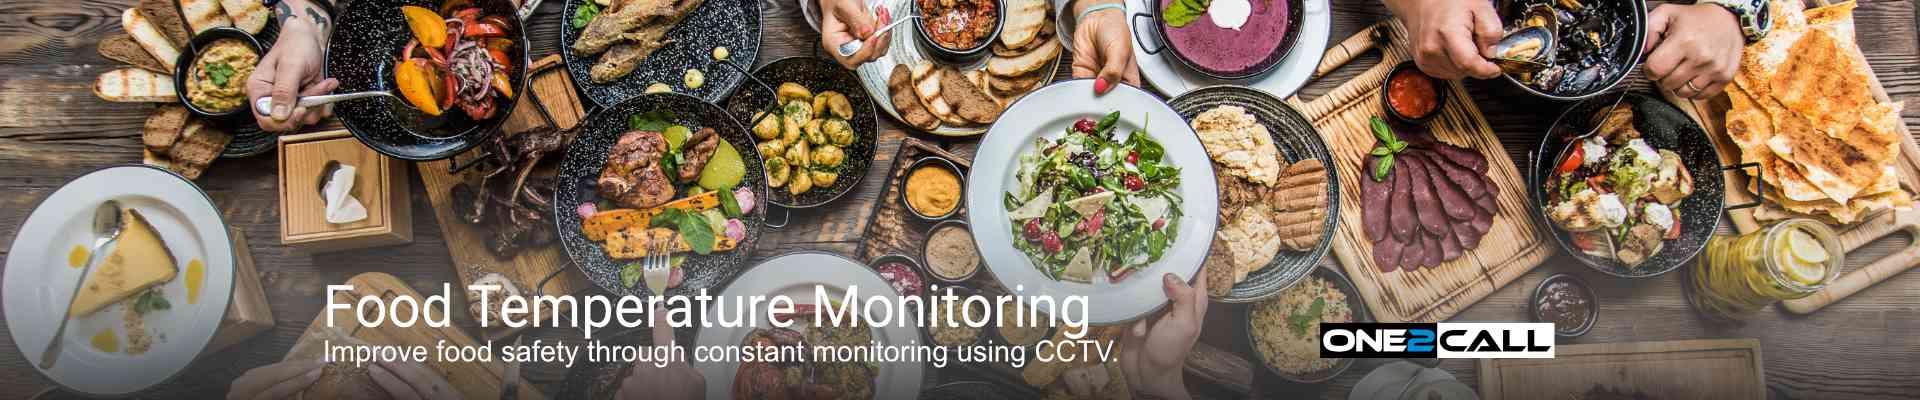 Food Temperature Monitoring Cameras - Improve food safety through constant monitoring using CCTV.